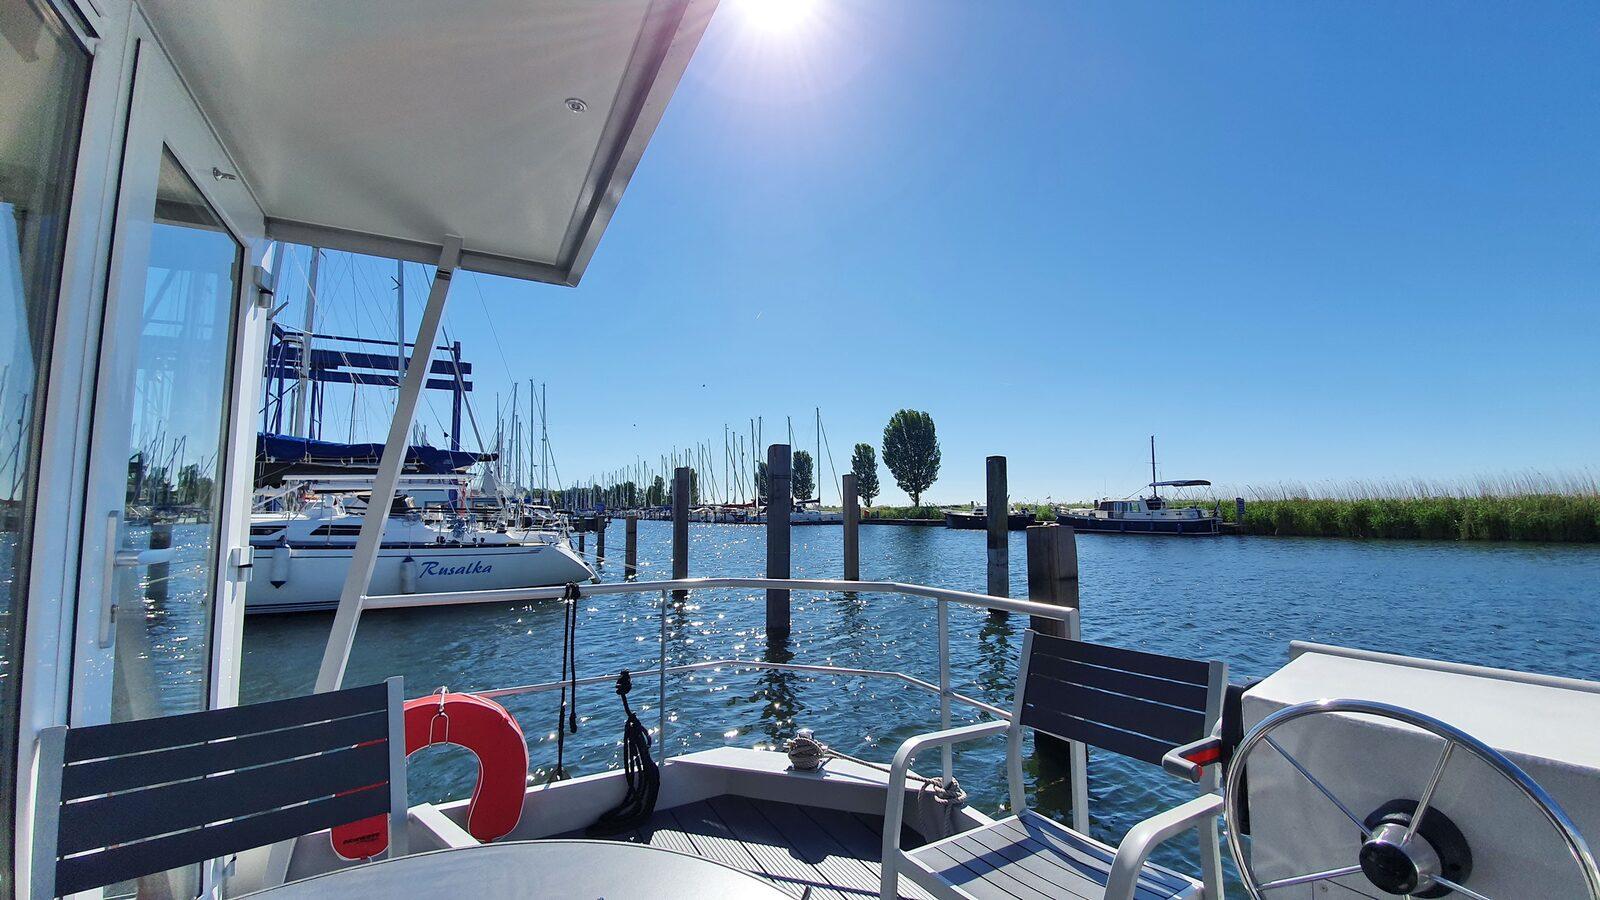 Havenlodge pour six personnes Deko Marina Lelystad